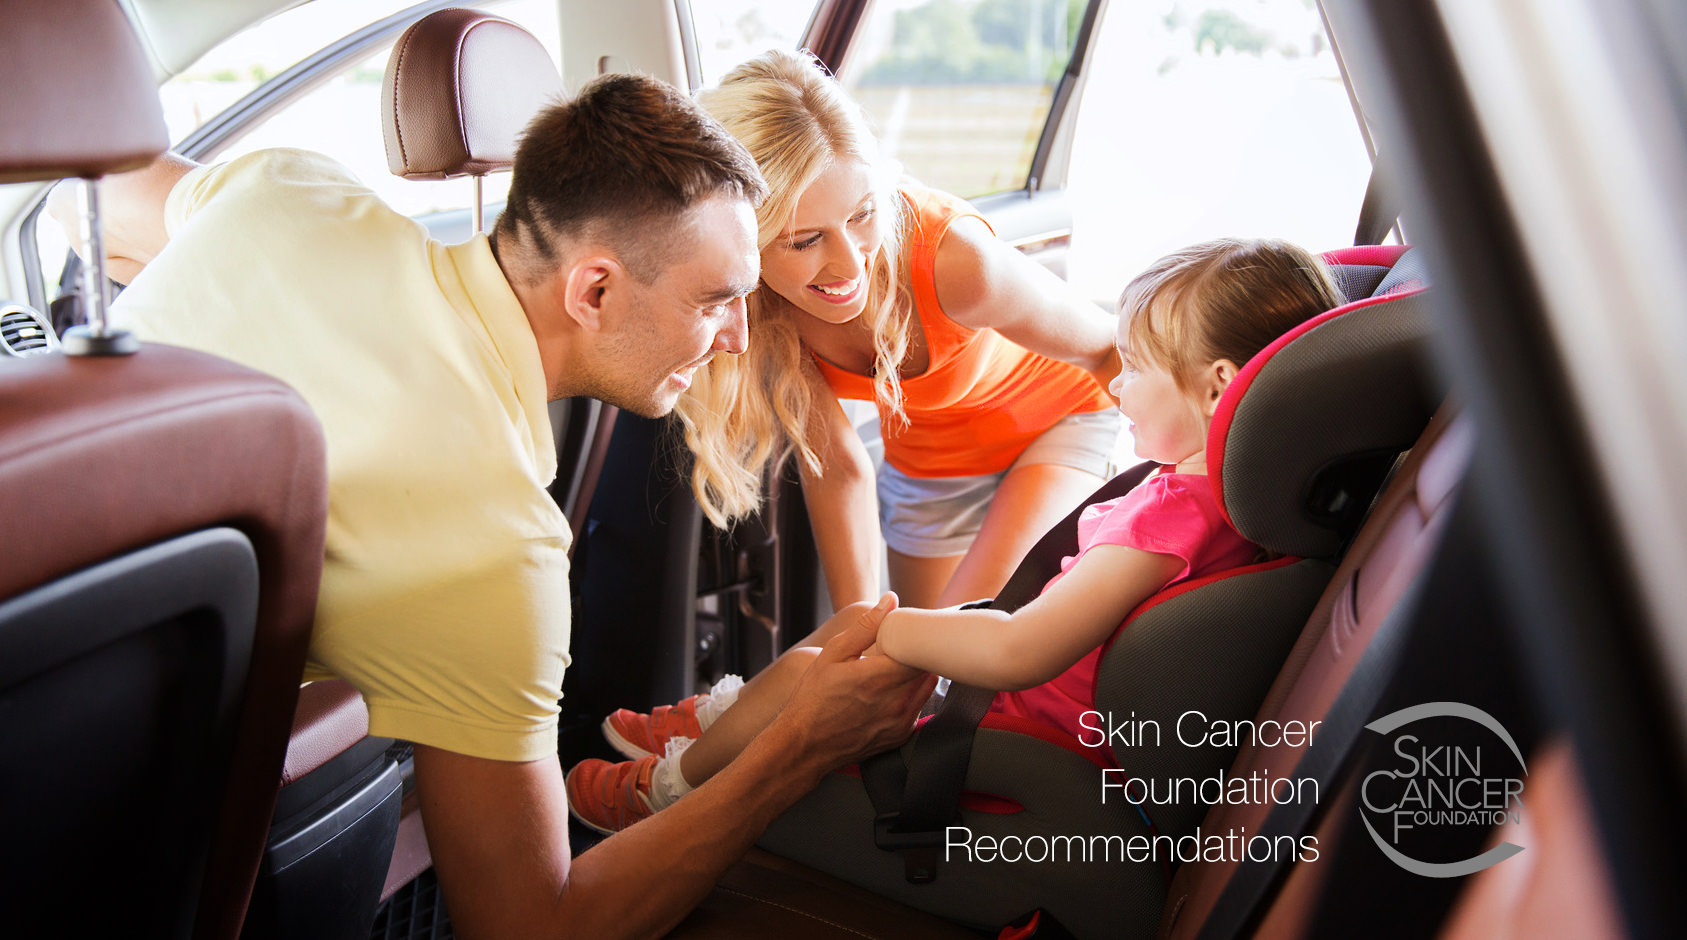 Skin Cancer Foundation Notes